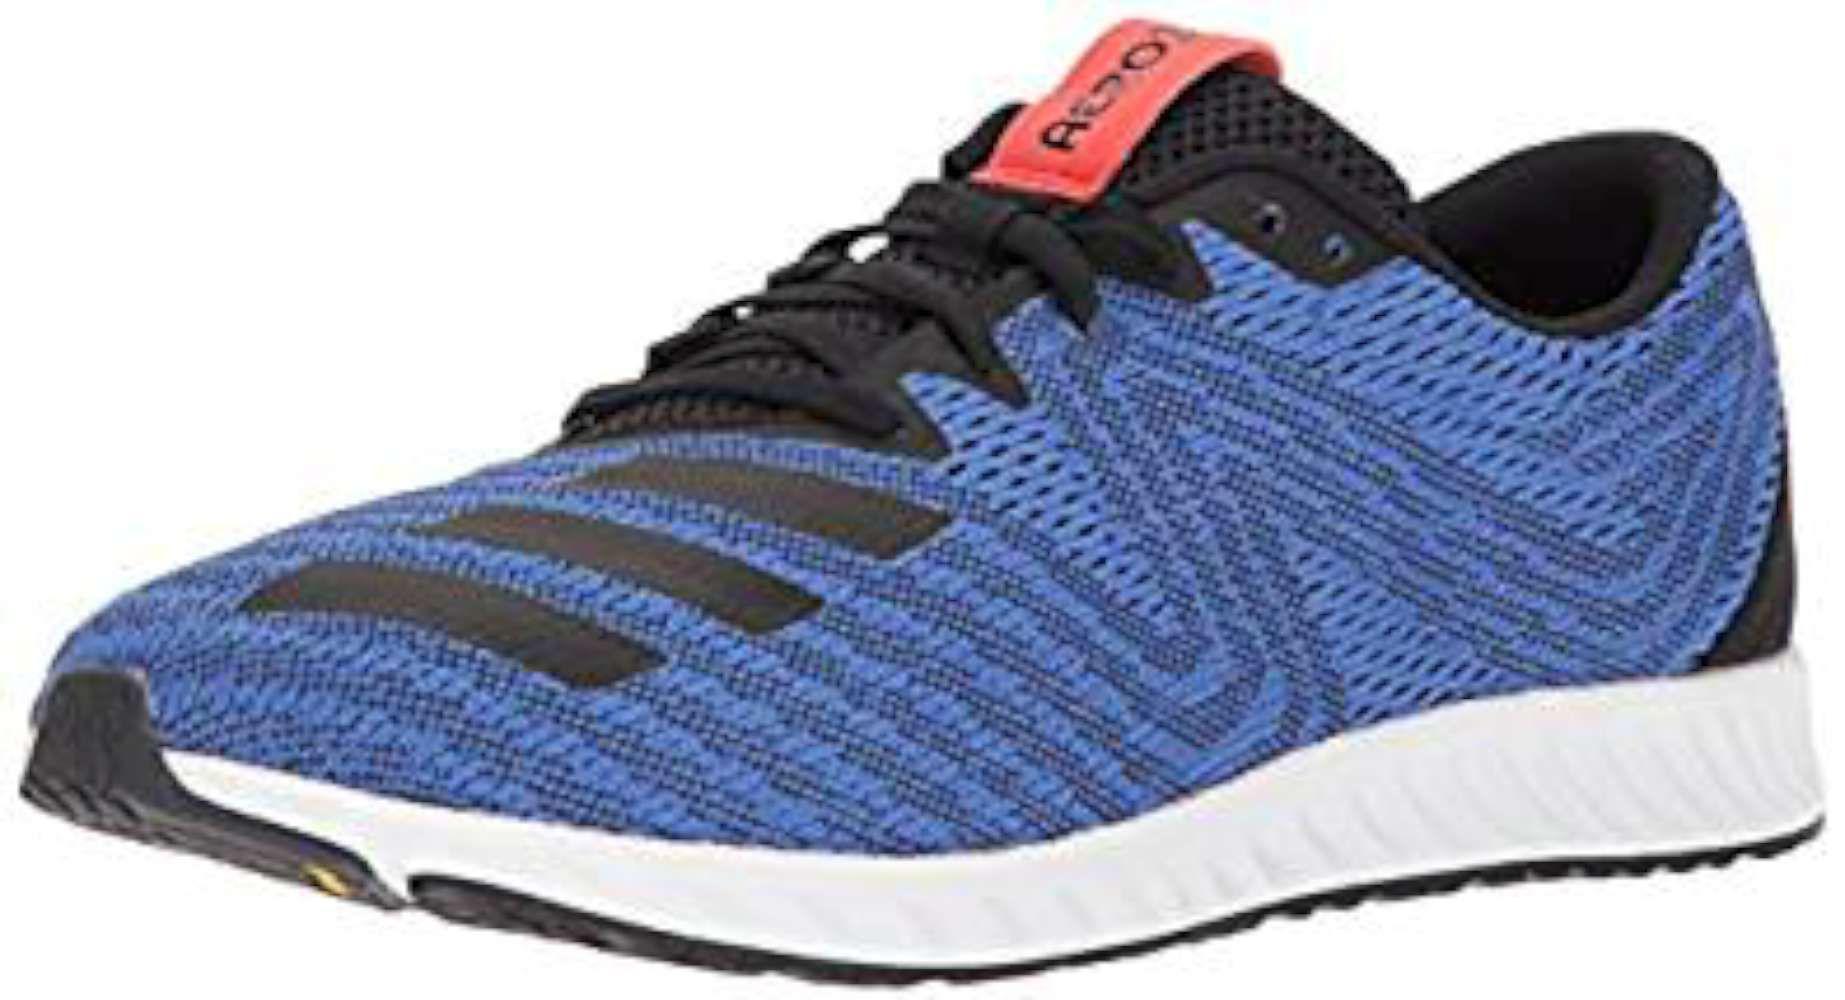 adidas. Black Mens Aerobounce Pr M Low Top Lace Up Trail Running Shoes 7c34636a0